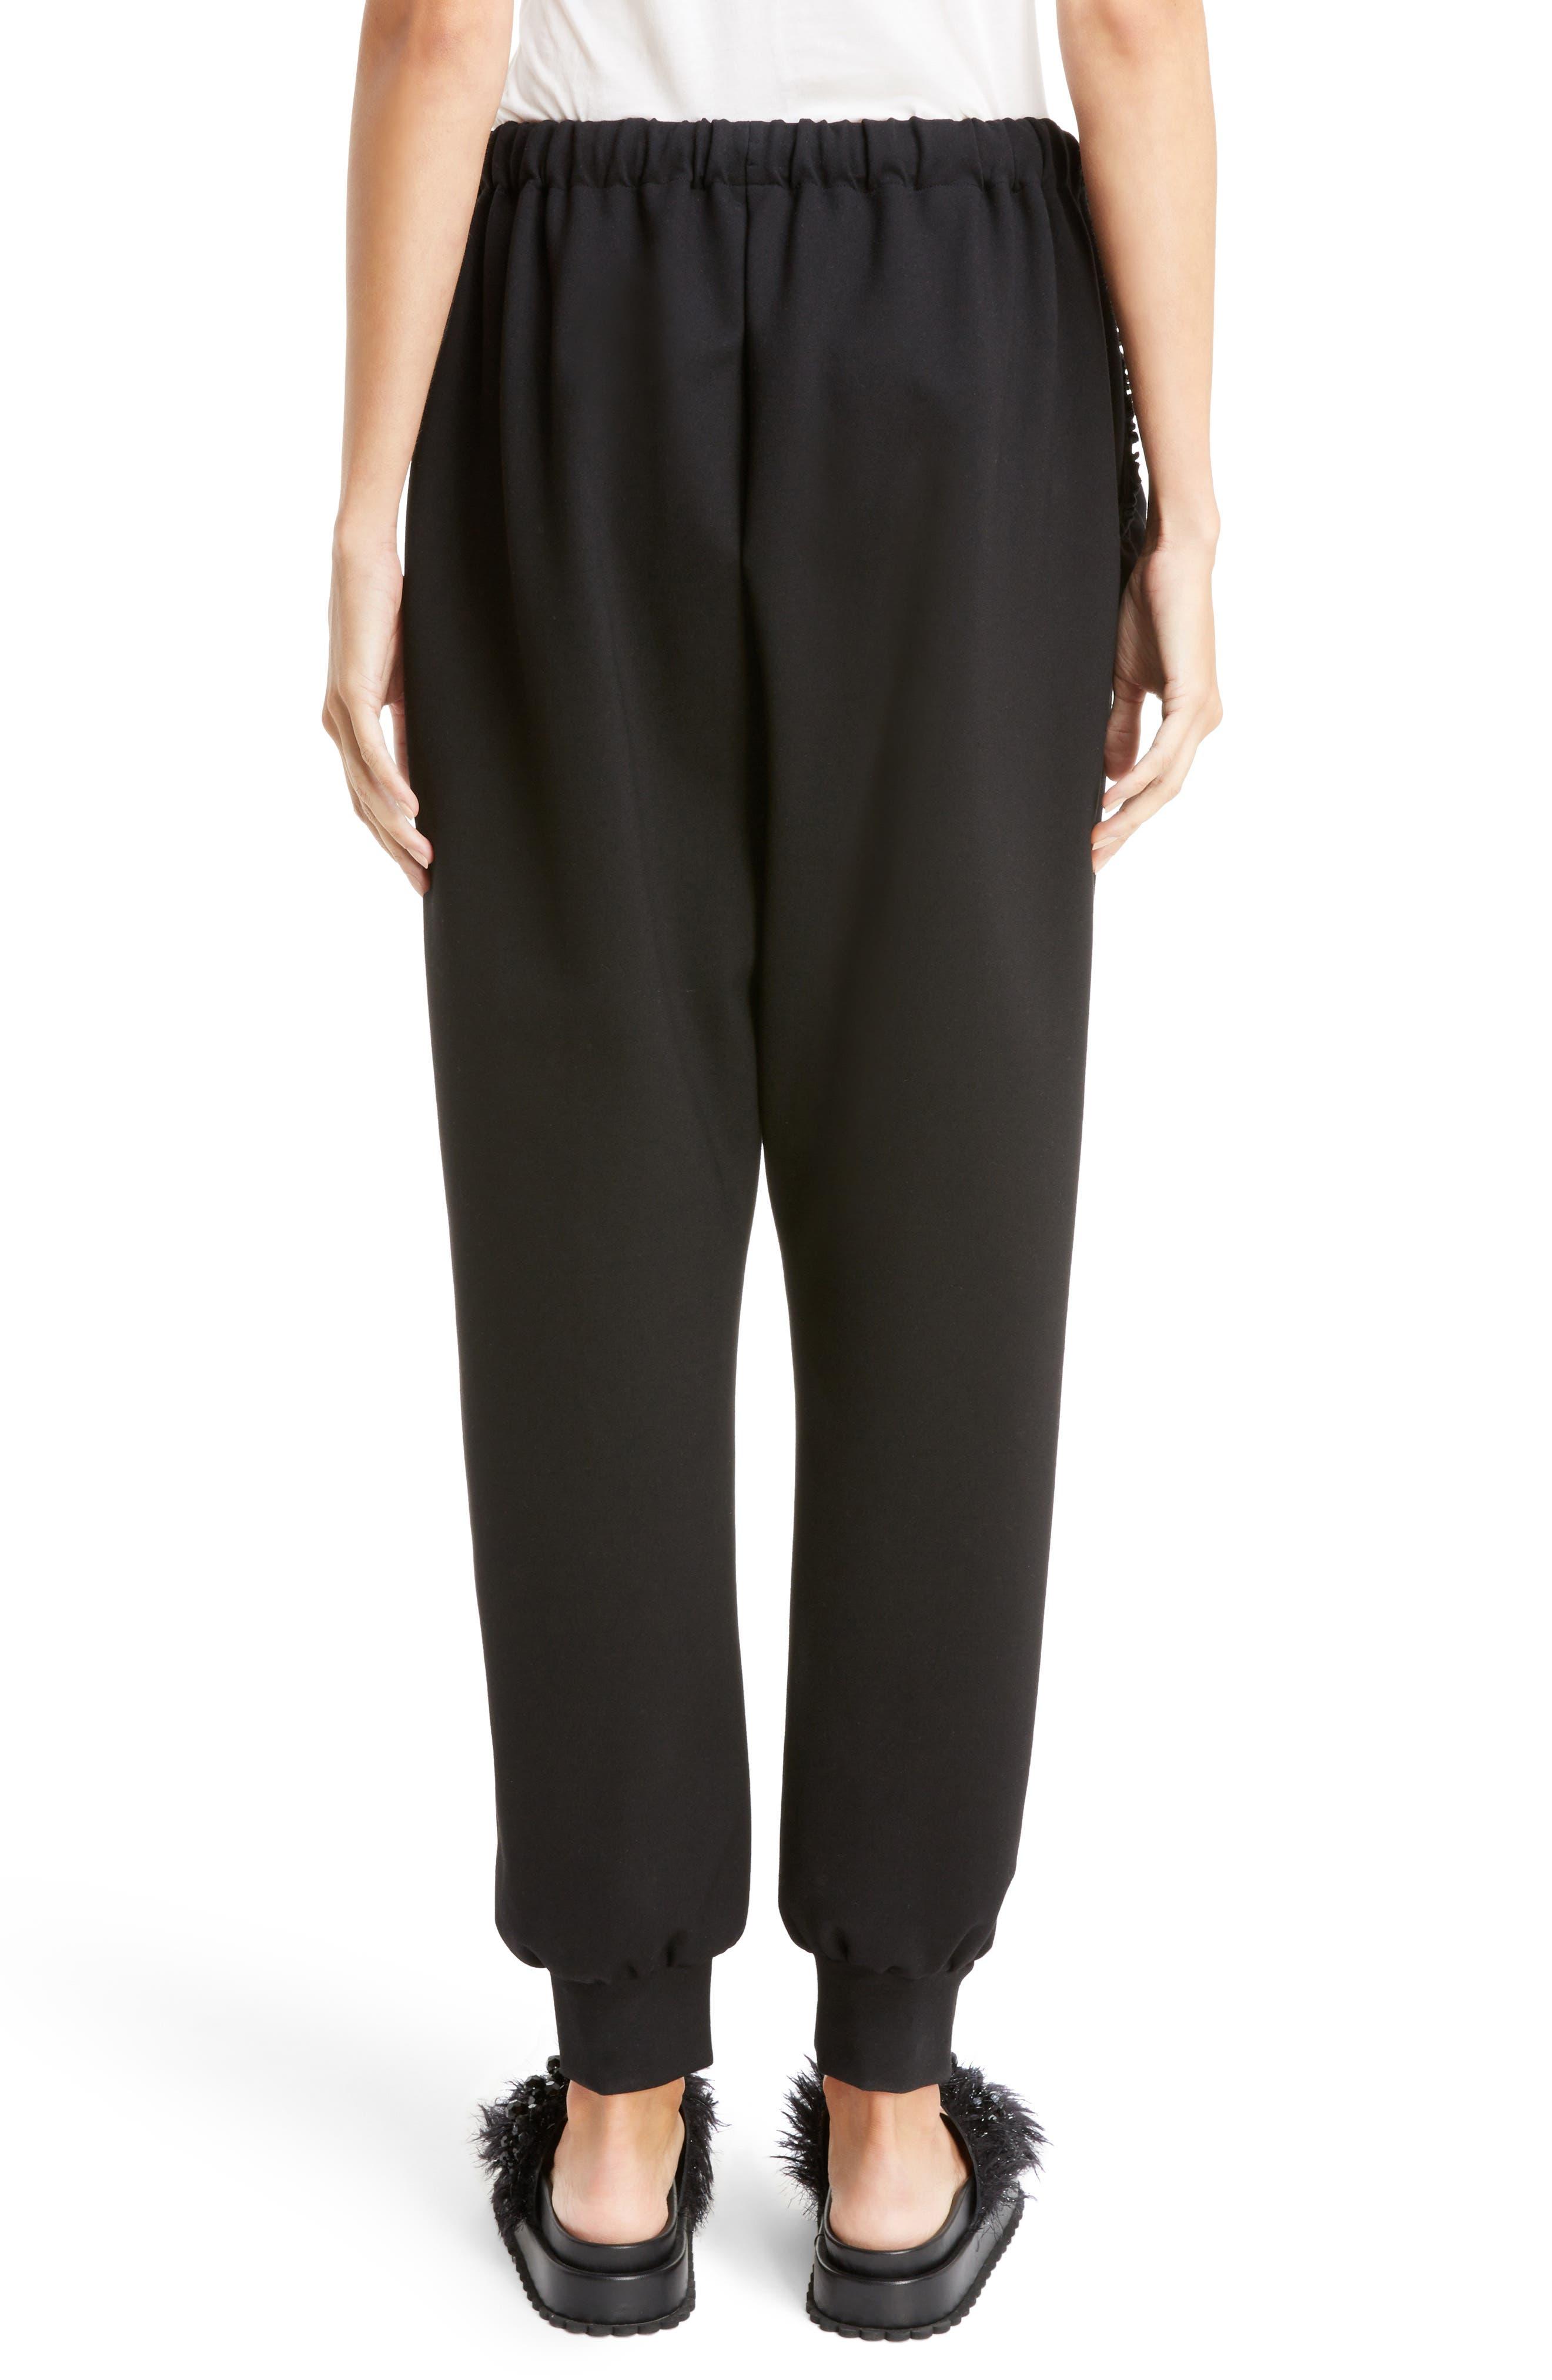 Ruffle Embellished Jogging Pants,                             Alternate thumbnail 2, color,                             BLACK